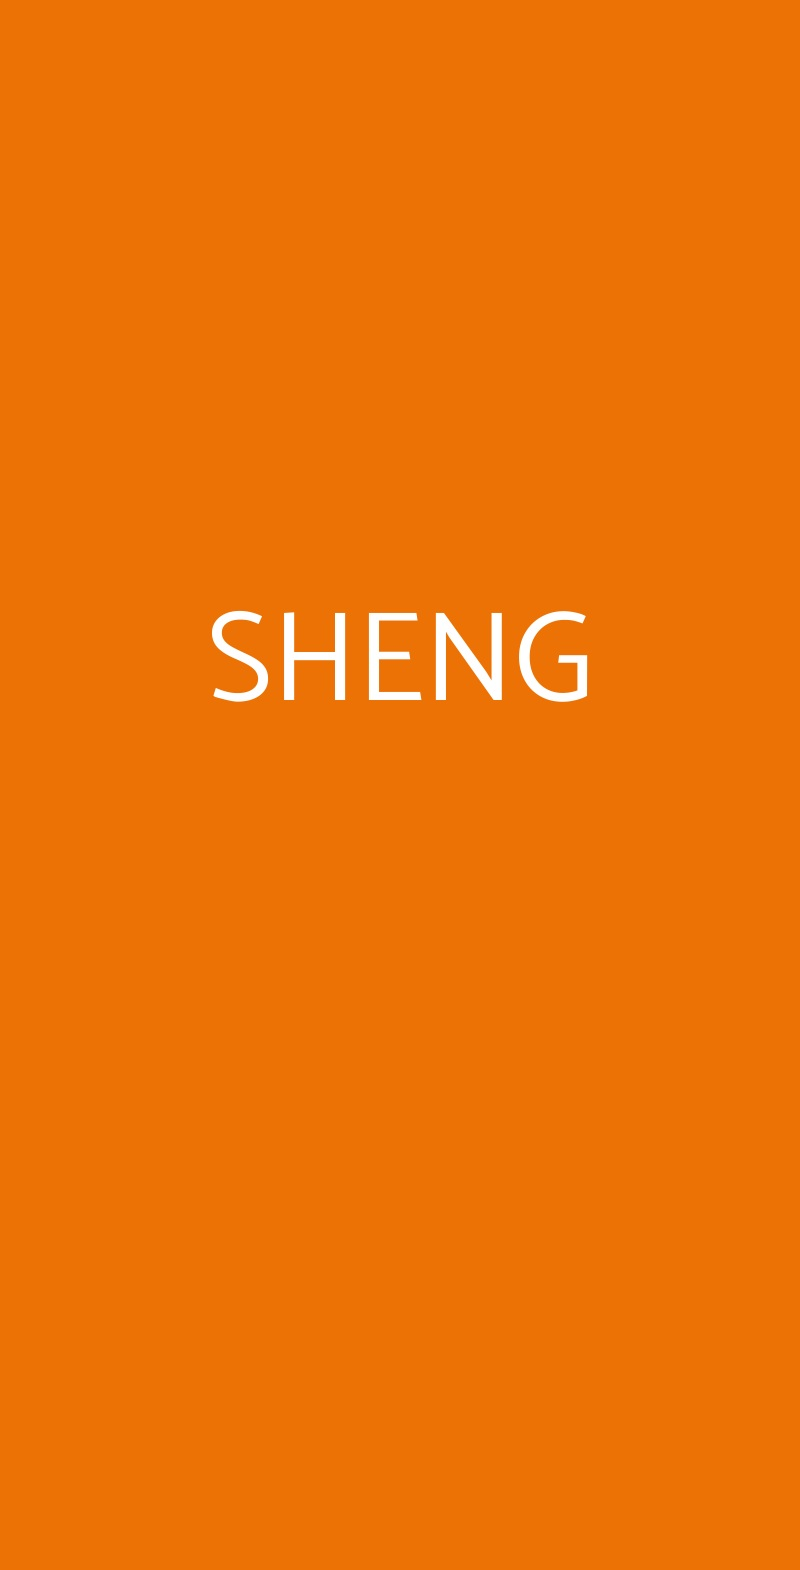 SHENG Genova menù 1 pagina